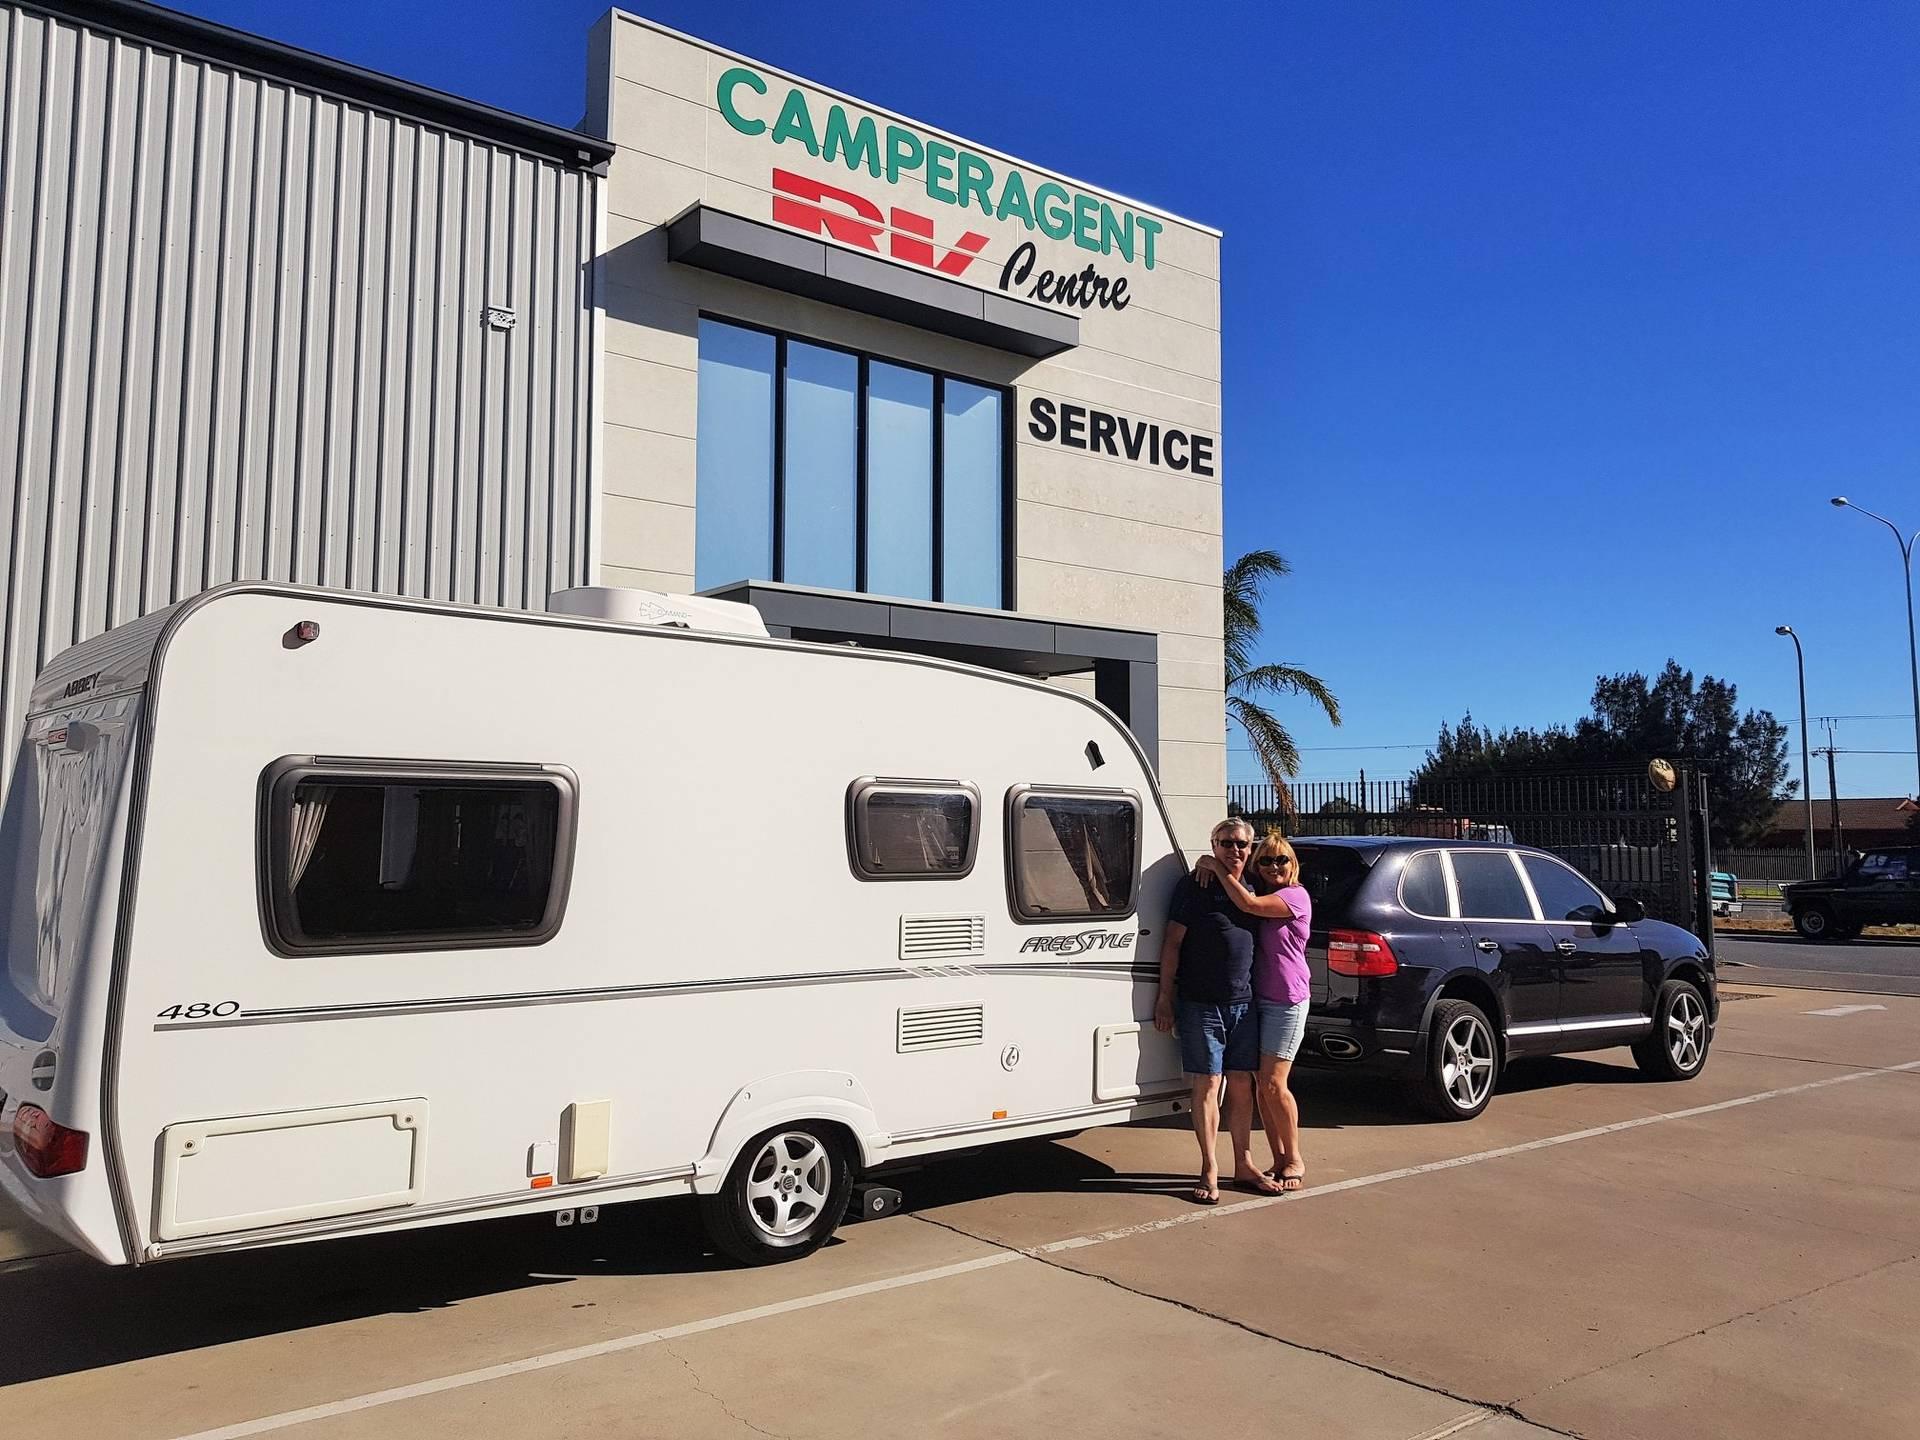 Camperagent RV Centre Adelaide